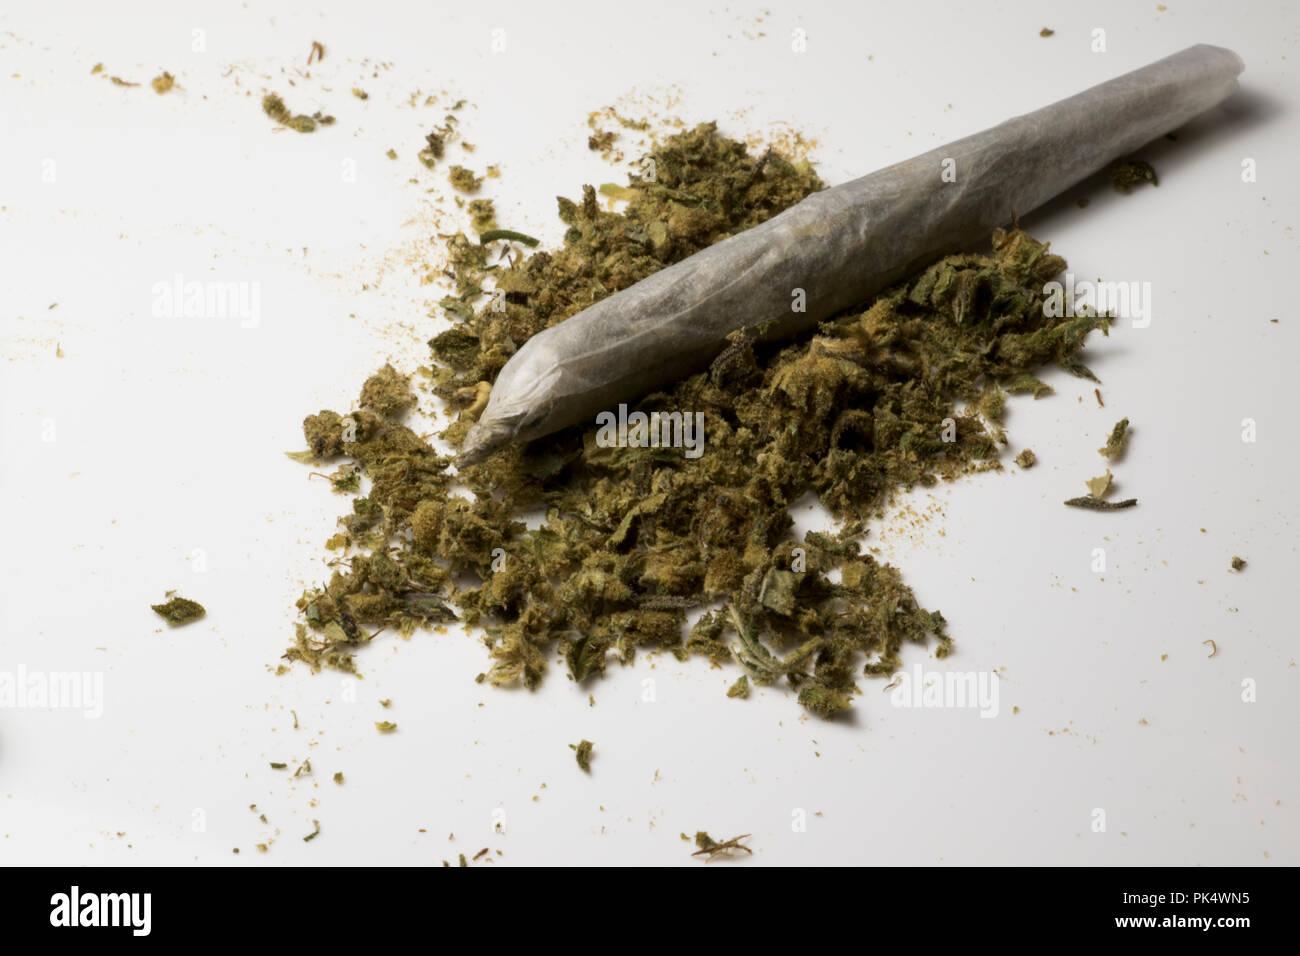 Ganja plant. Marijuana cigarette with small pile of weed. Medicinal cannabis. - Stock Image